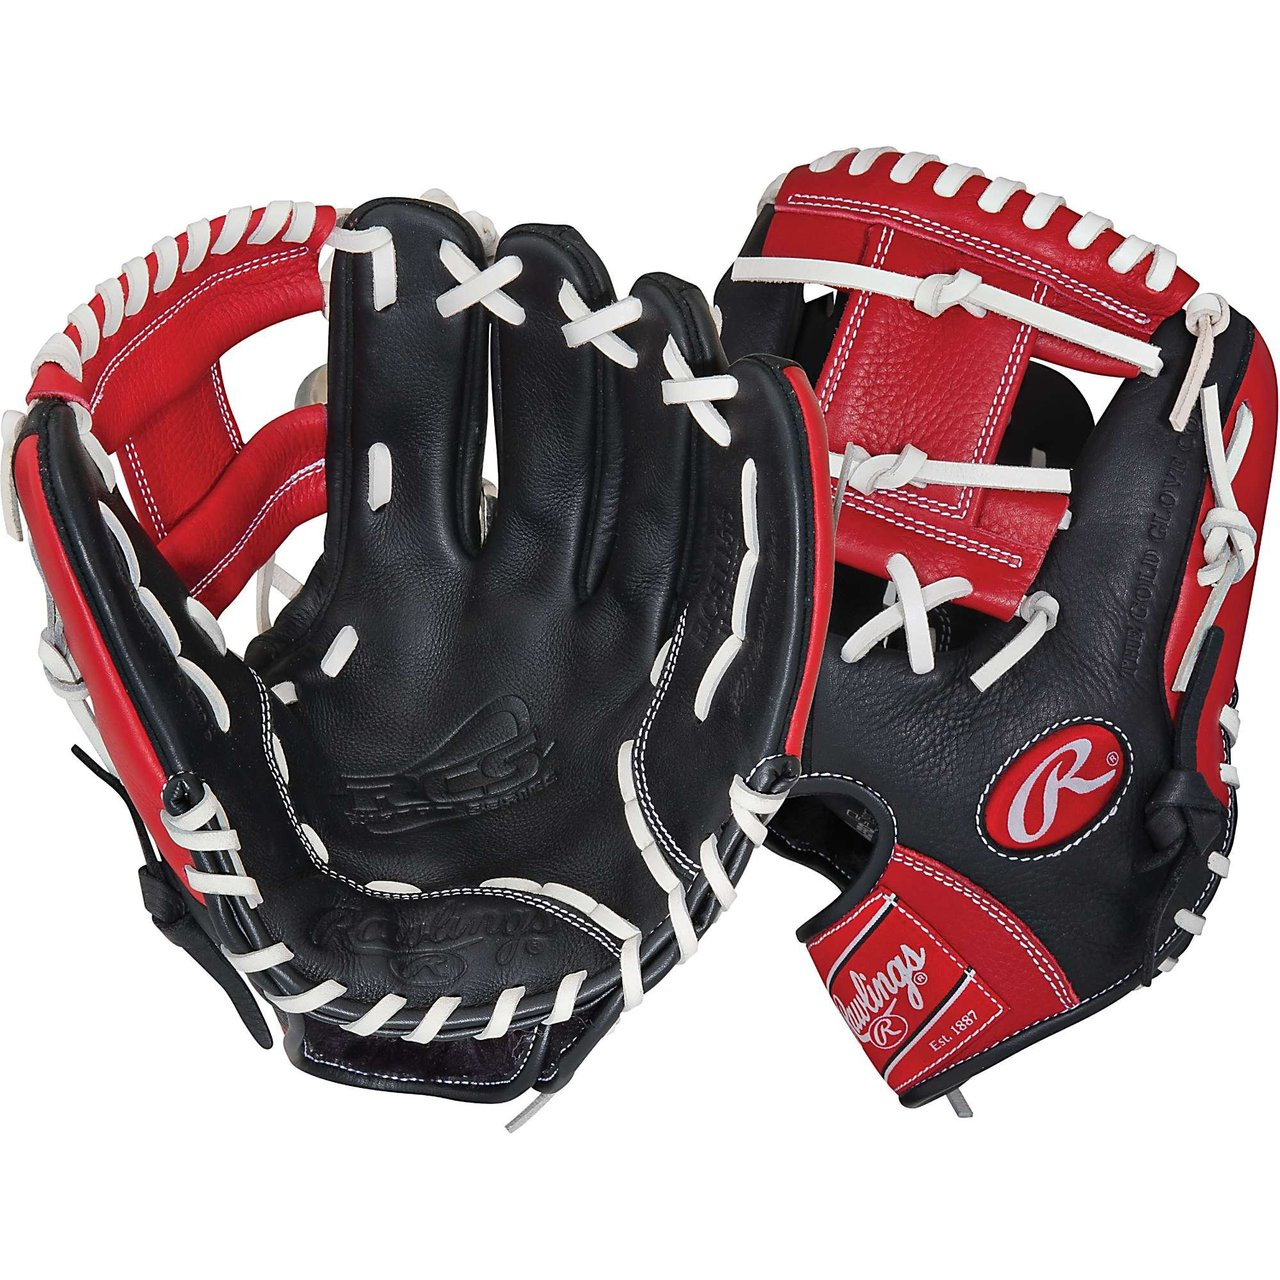 rawlings-rcs-series-11-5-inch-baseball-glove-rcs115s-right-hand-throw RCS115S-Right Hand Throw Rawlings New Rawlings RCS Series 11.5 inch Baseball Glove RCS115S Right Hand Throw